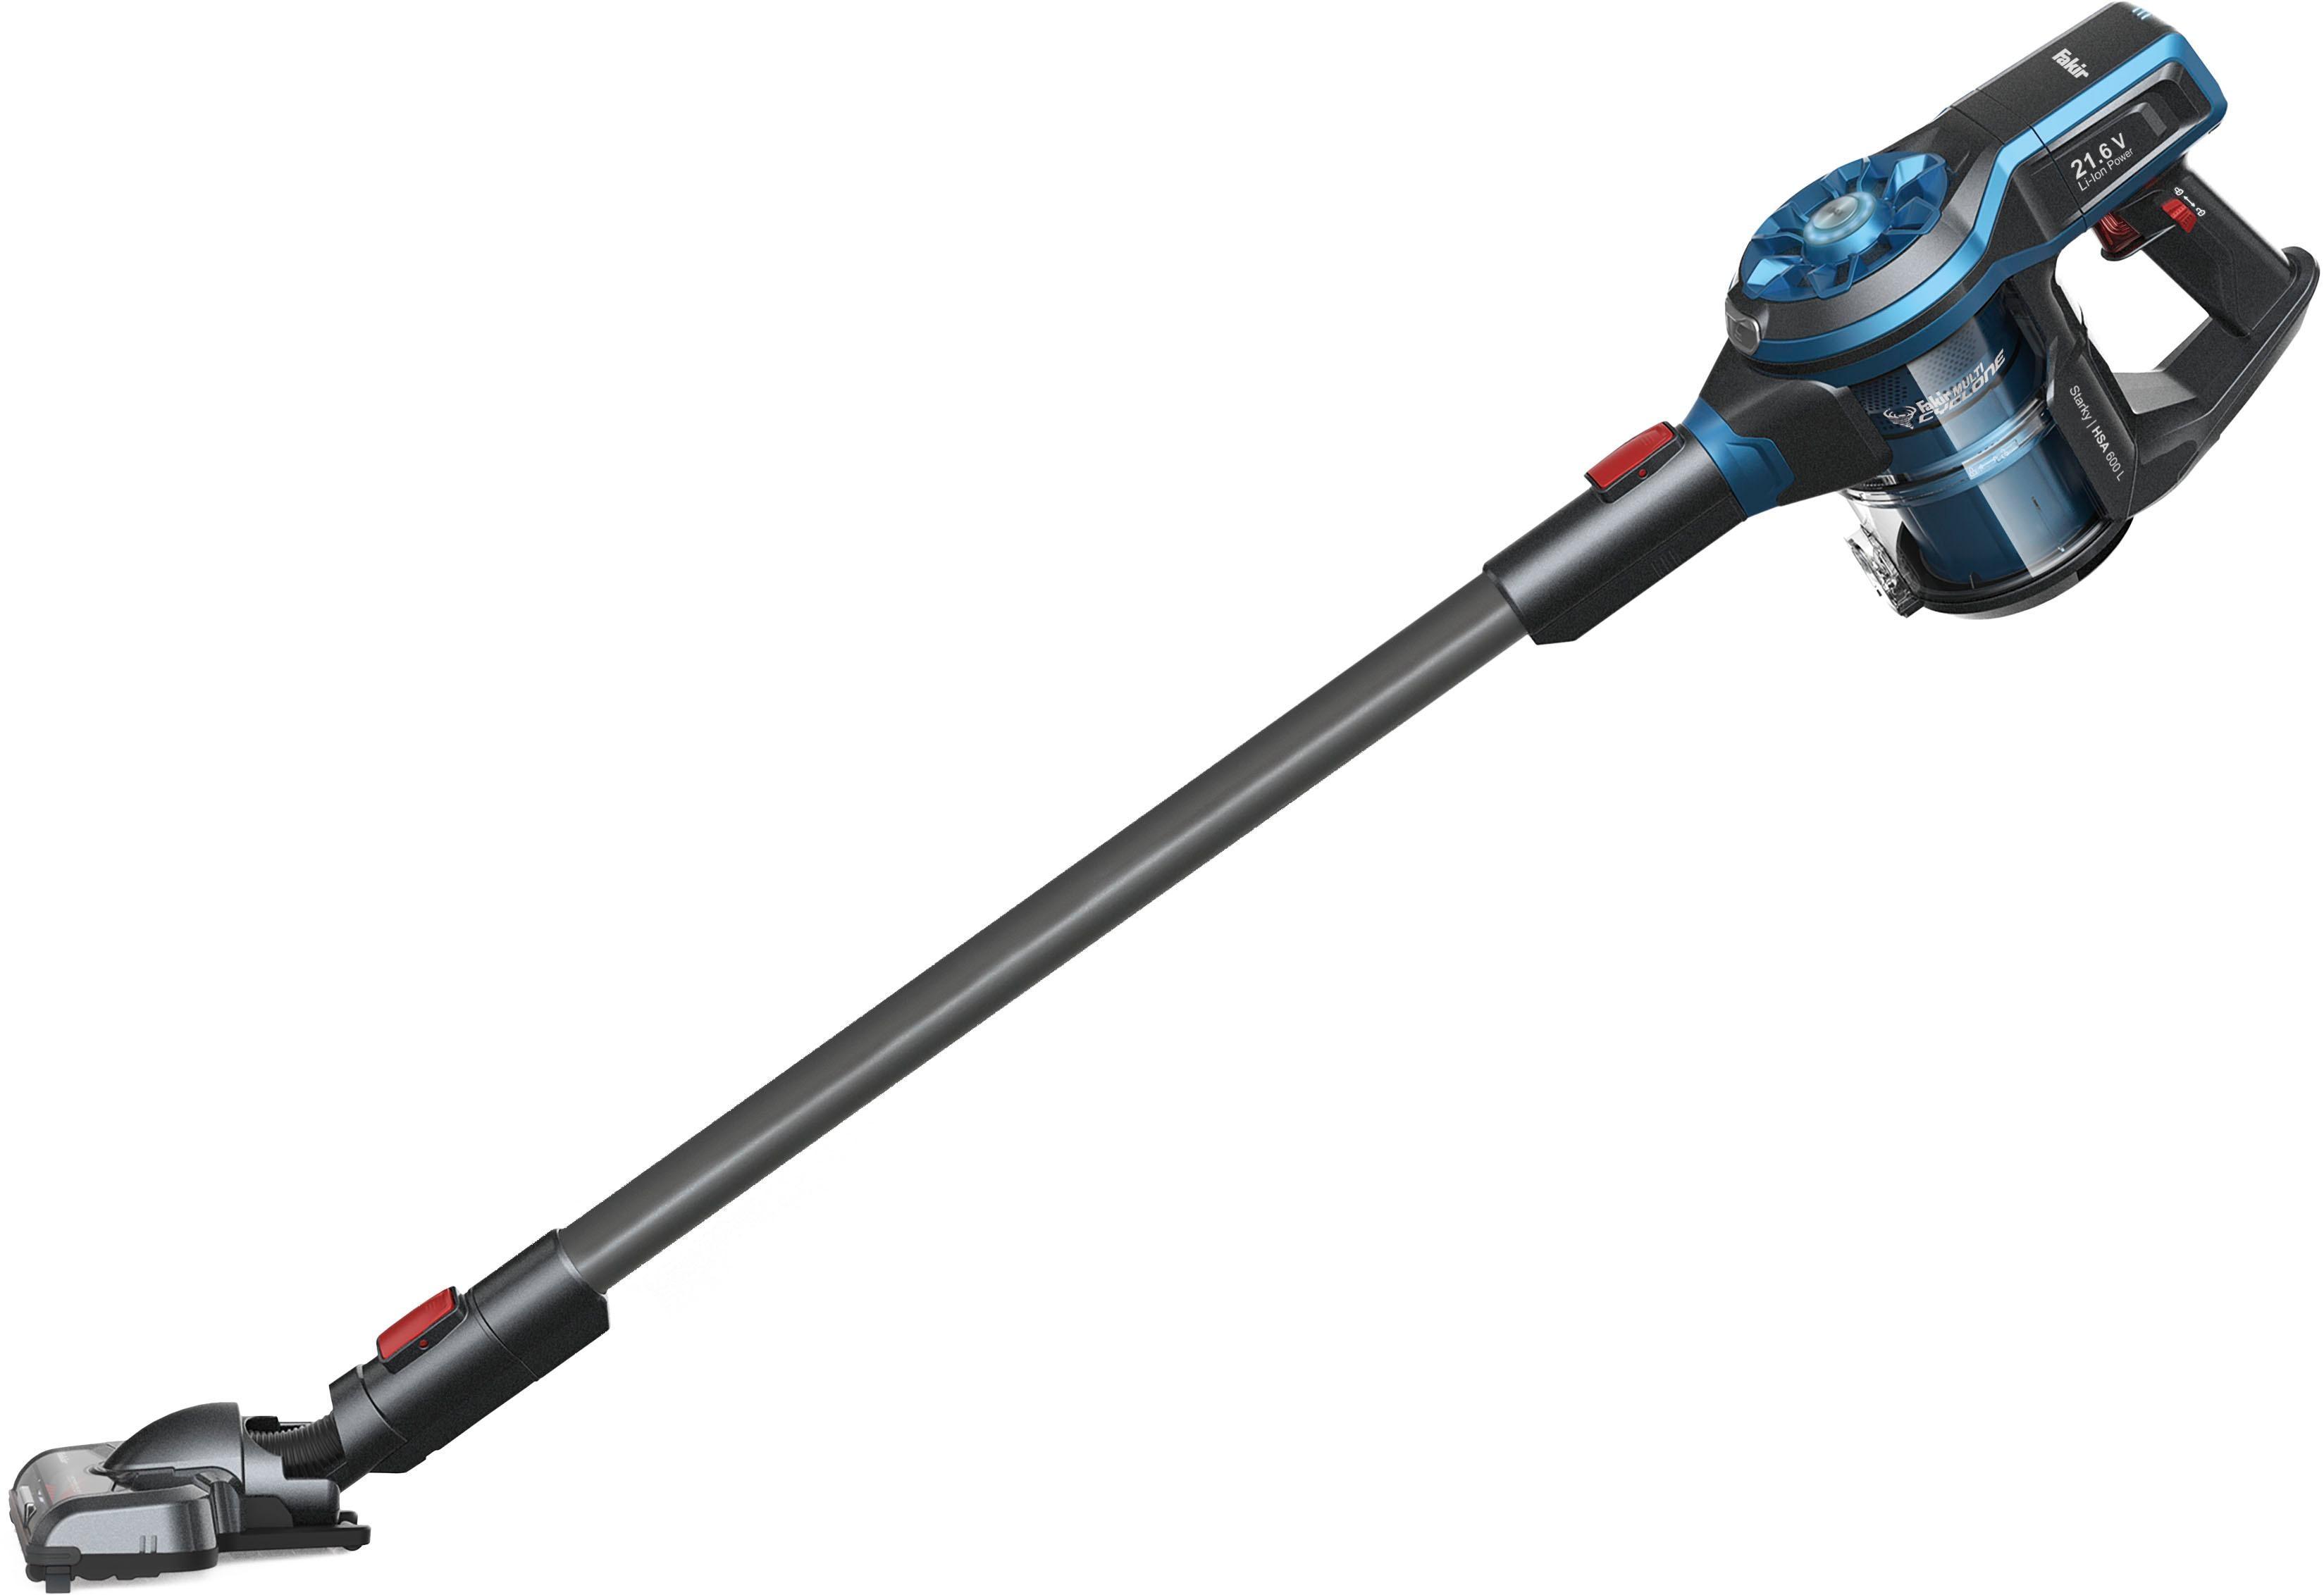 FAKIR Akku-Hand-und Stielstaubsauger Starky HSA 600 L 21 6 Watt beutellos   Flur & Diele > Haushaltsgeräte > Staubsauger   Blau   Fakir